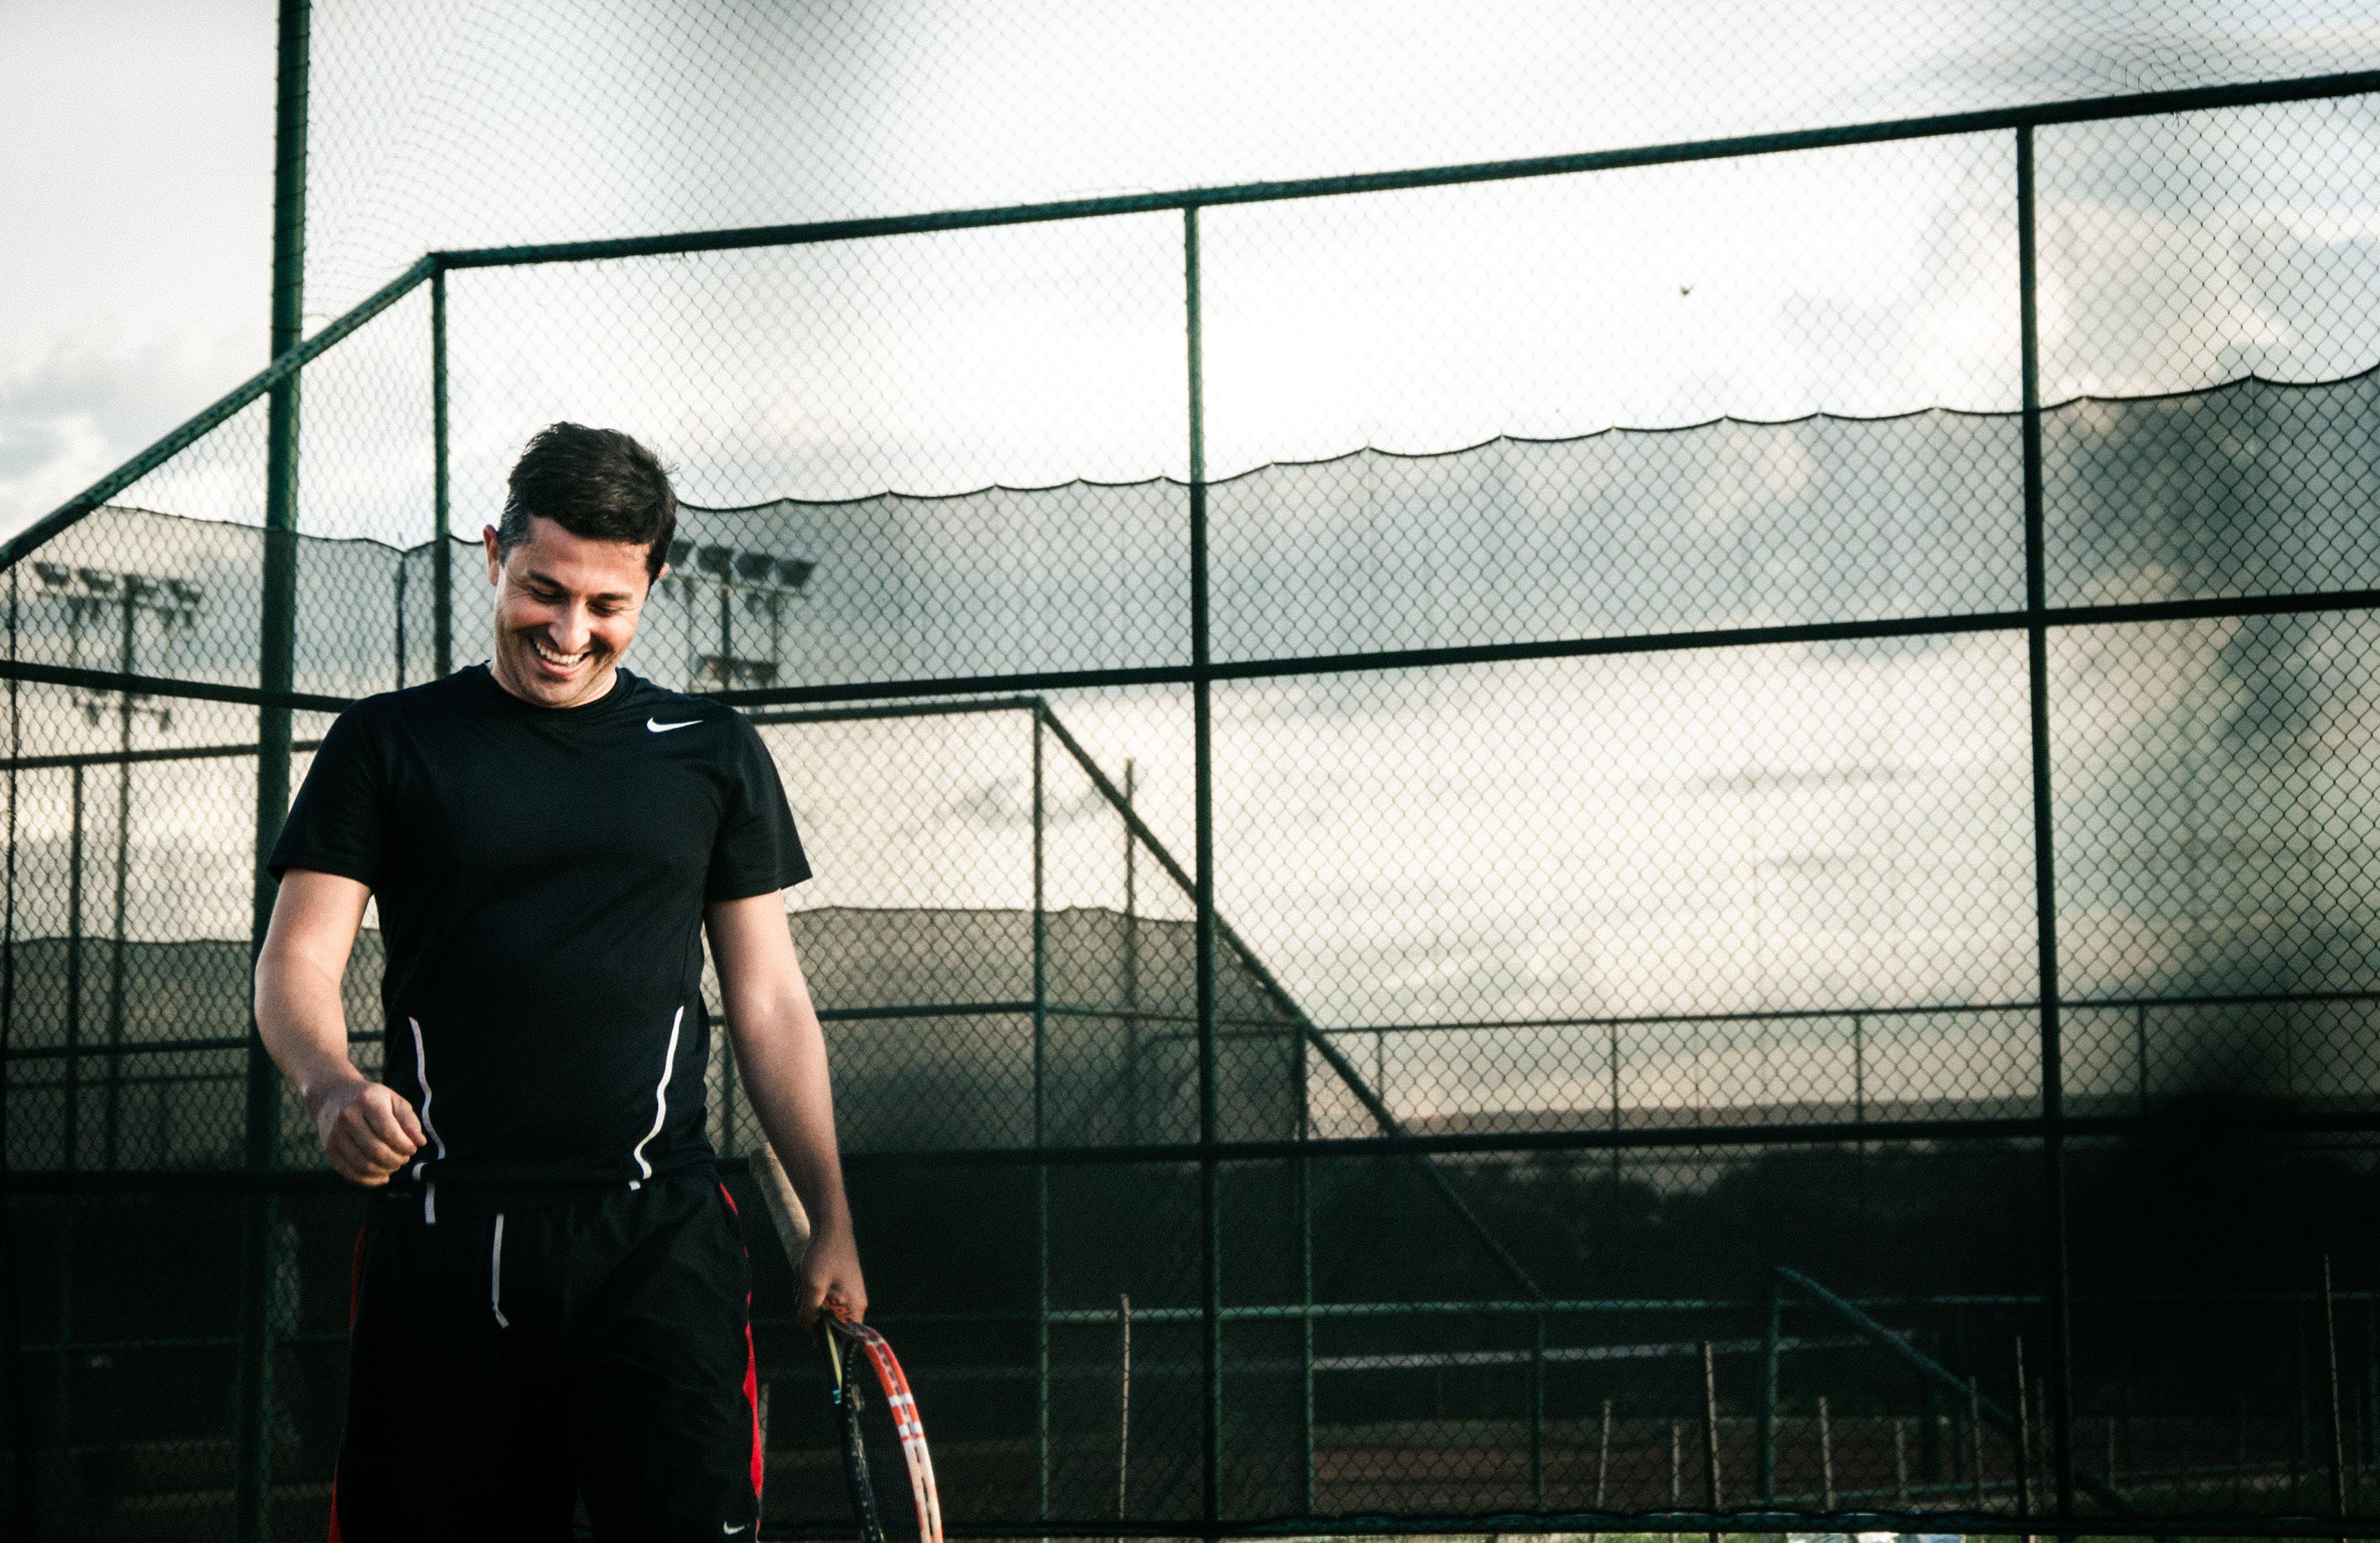 Man Wearing Black Nike Dri-fit Shirt Holding a Tennis Racket